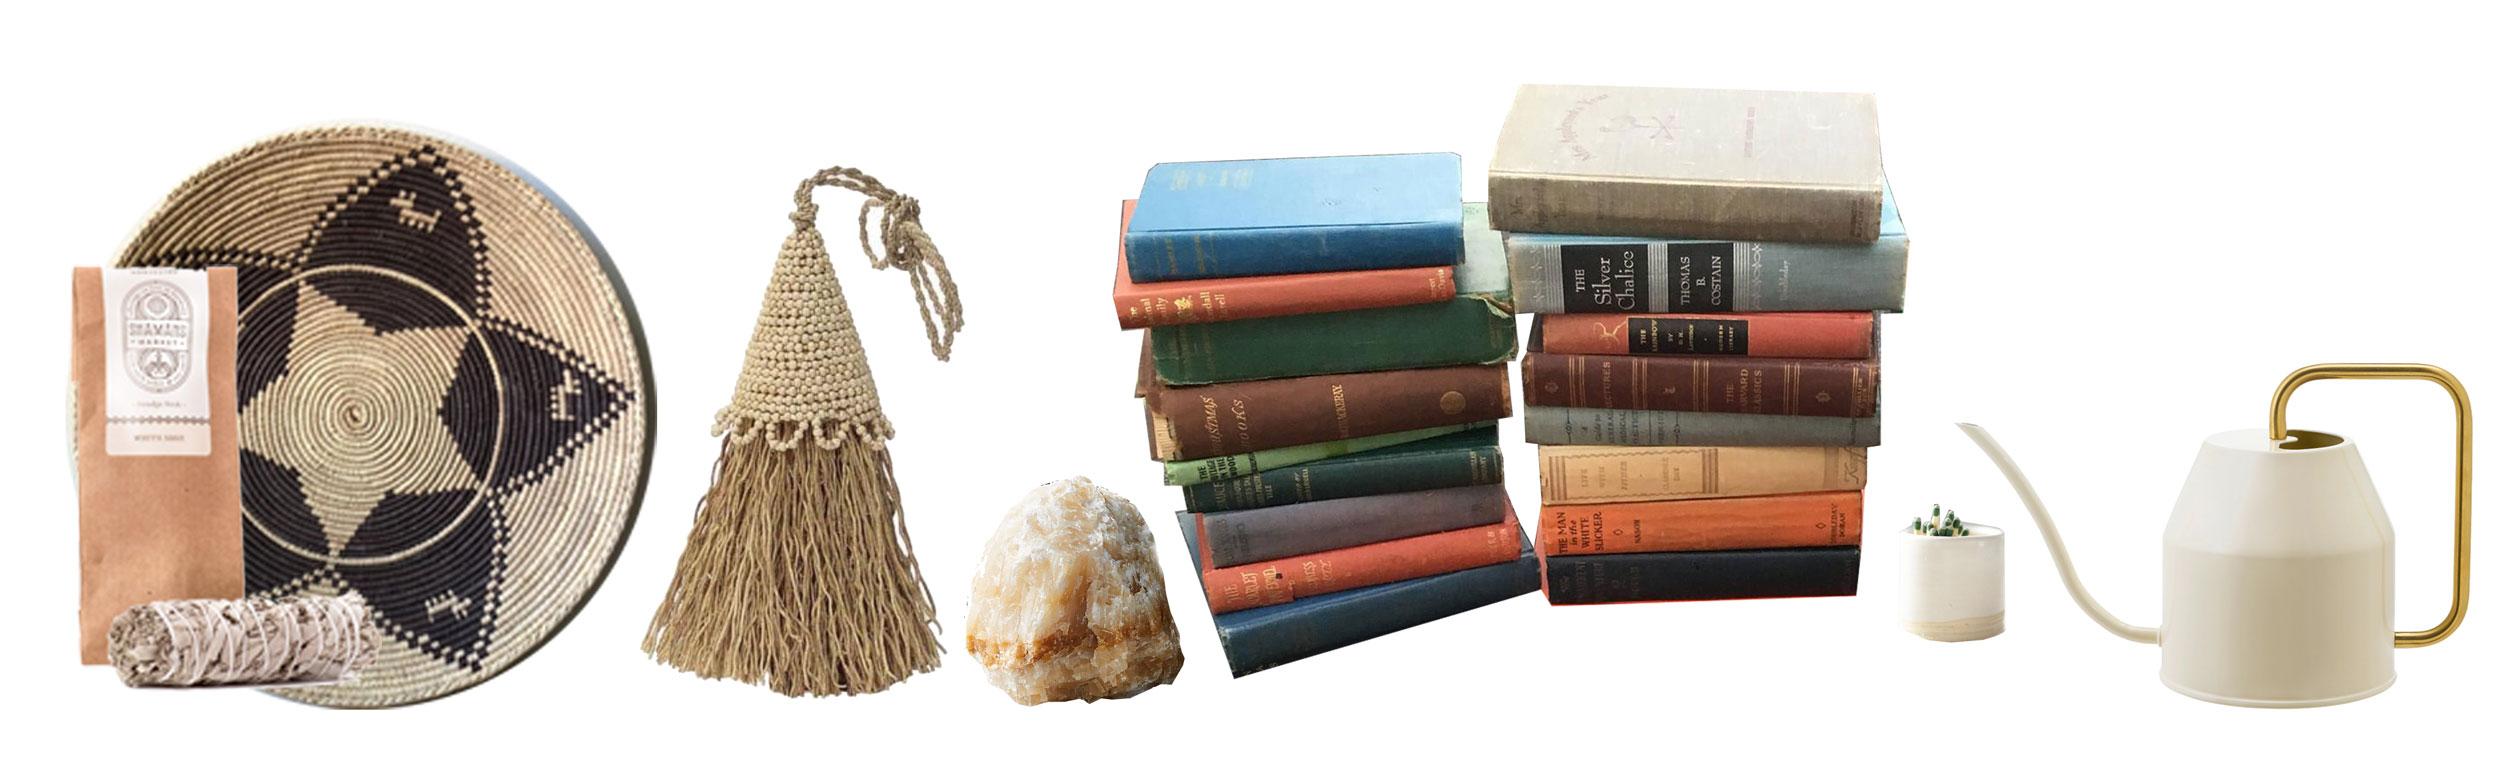 Sage Smudge Sticks:  Shamans Market  | Pakistani Basket:  etsy.com/shop/MackenzieBryantCo  | Vetiver Tassel Room Freshener:  Connected Goods  | Raw Marble Object:  CB2  | Assorted Antique Books:  etsy.com/shop/ThePaintedTrunk  | Match Striker: Amazon | Watering Can:  Ikea